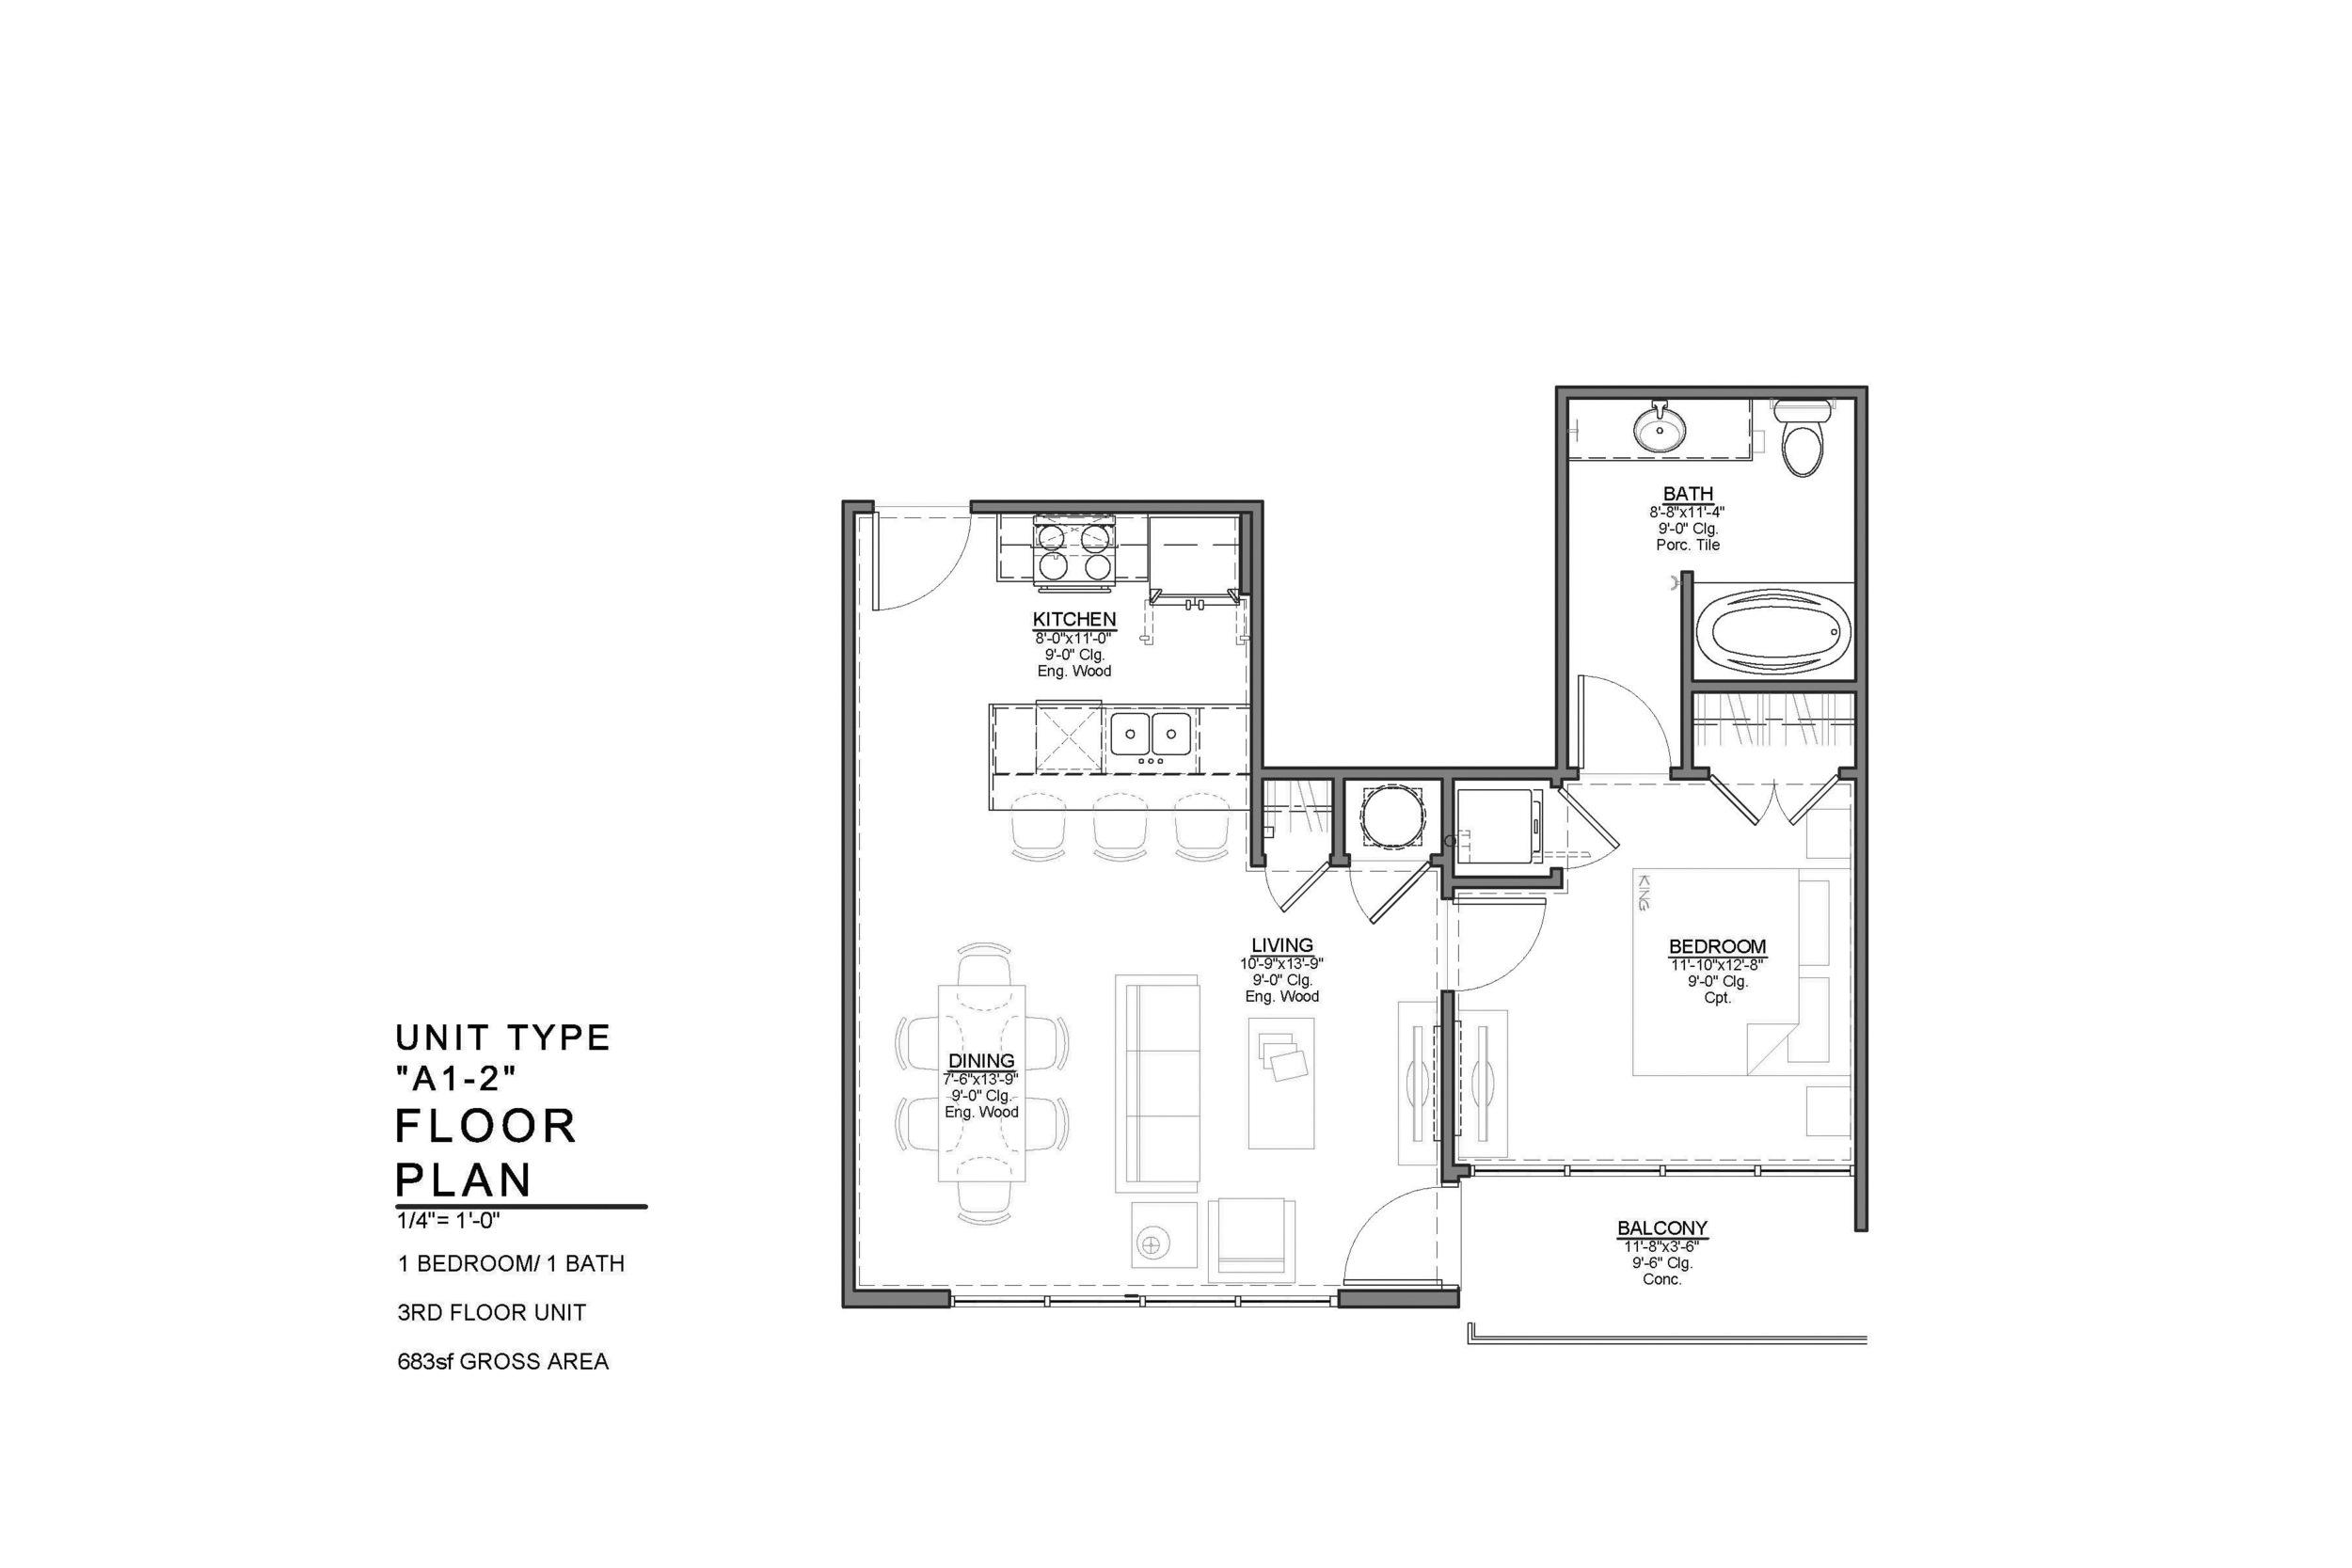 A1-2 FLOOR PLAN: 1 BEDROOM / 1 BATH